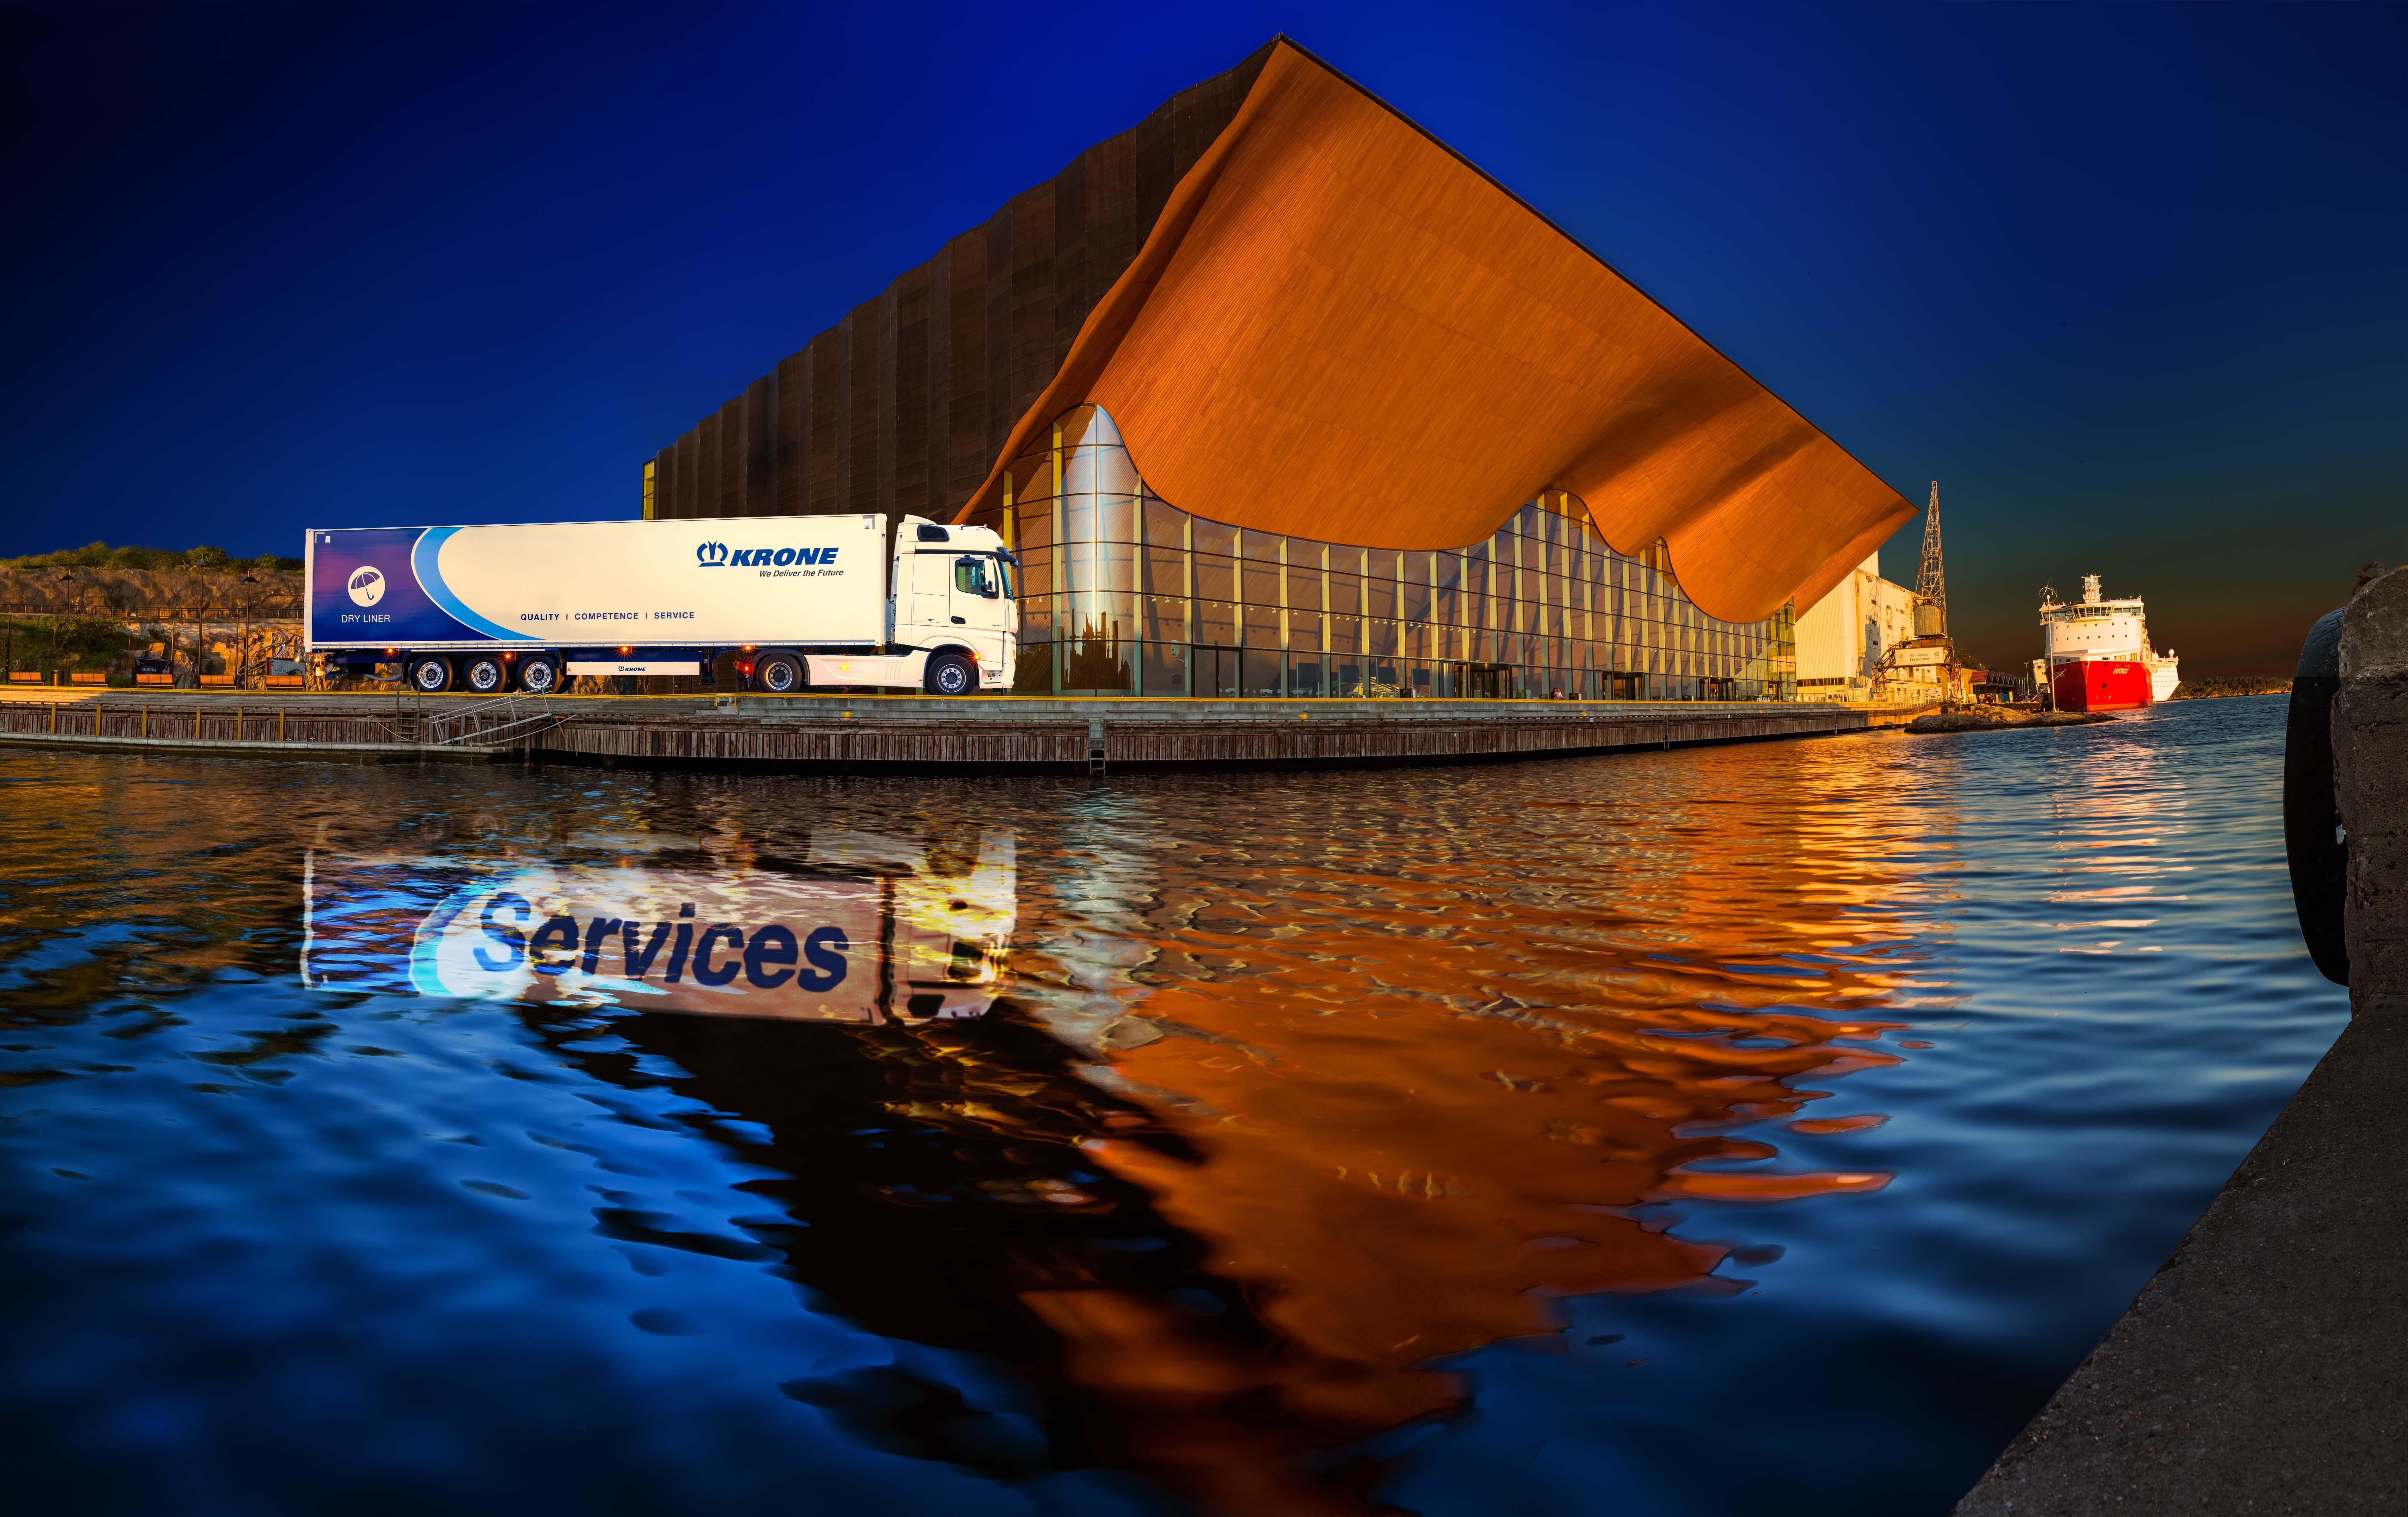 Kristiansand_Services